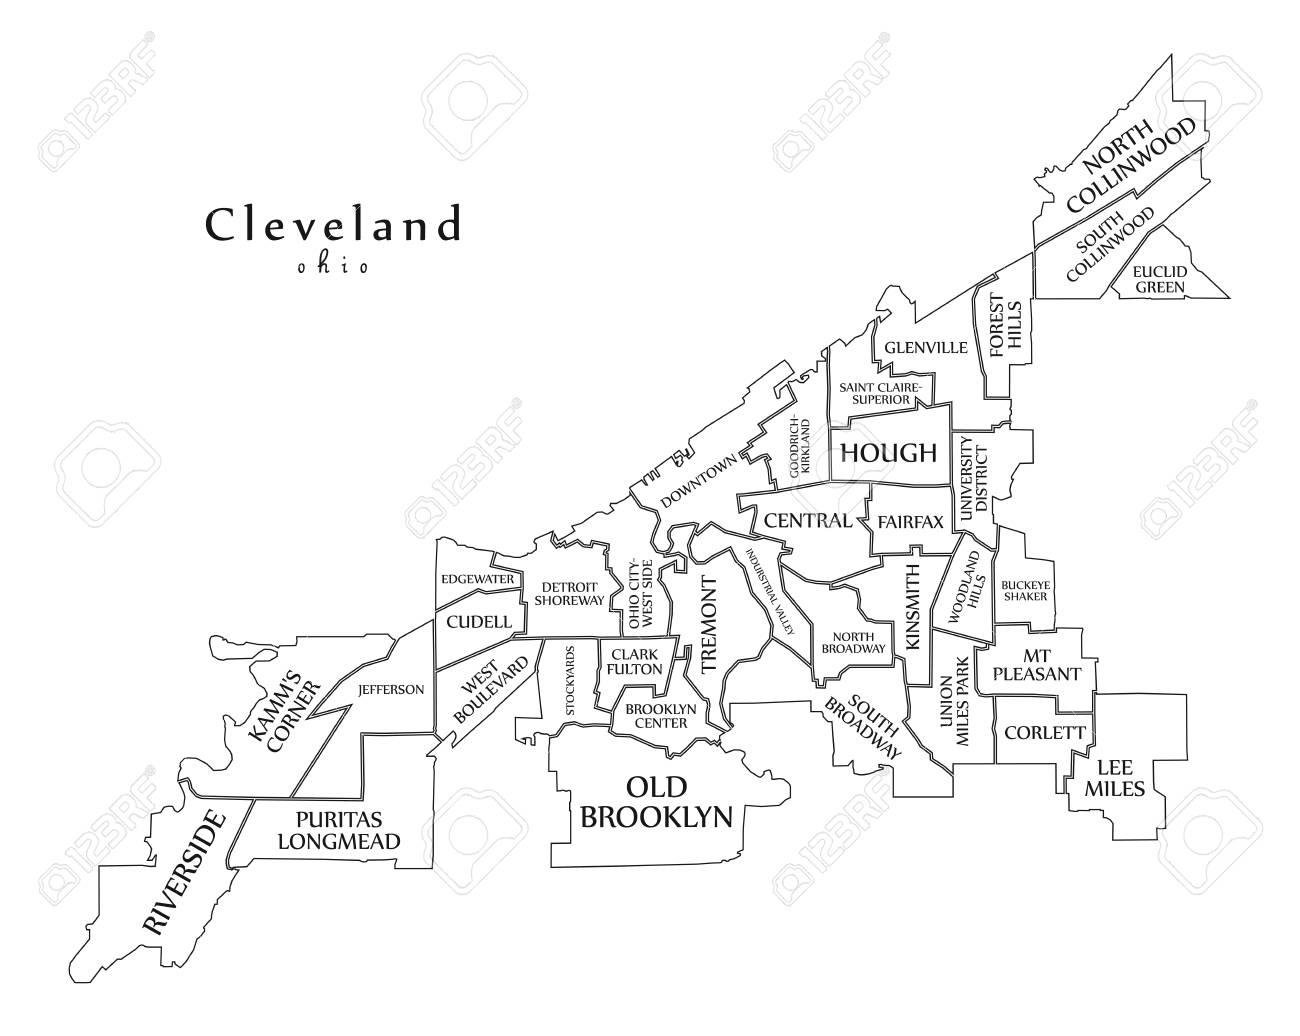 Modern City Map - Cleveland Ohio City Of The USA With Neighborhoods on